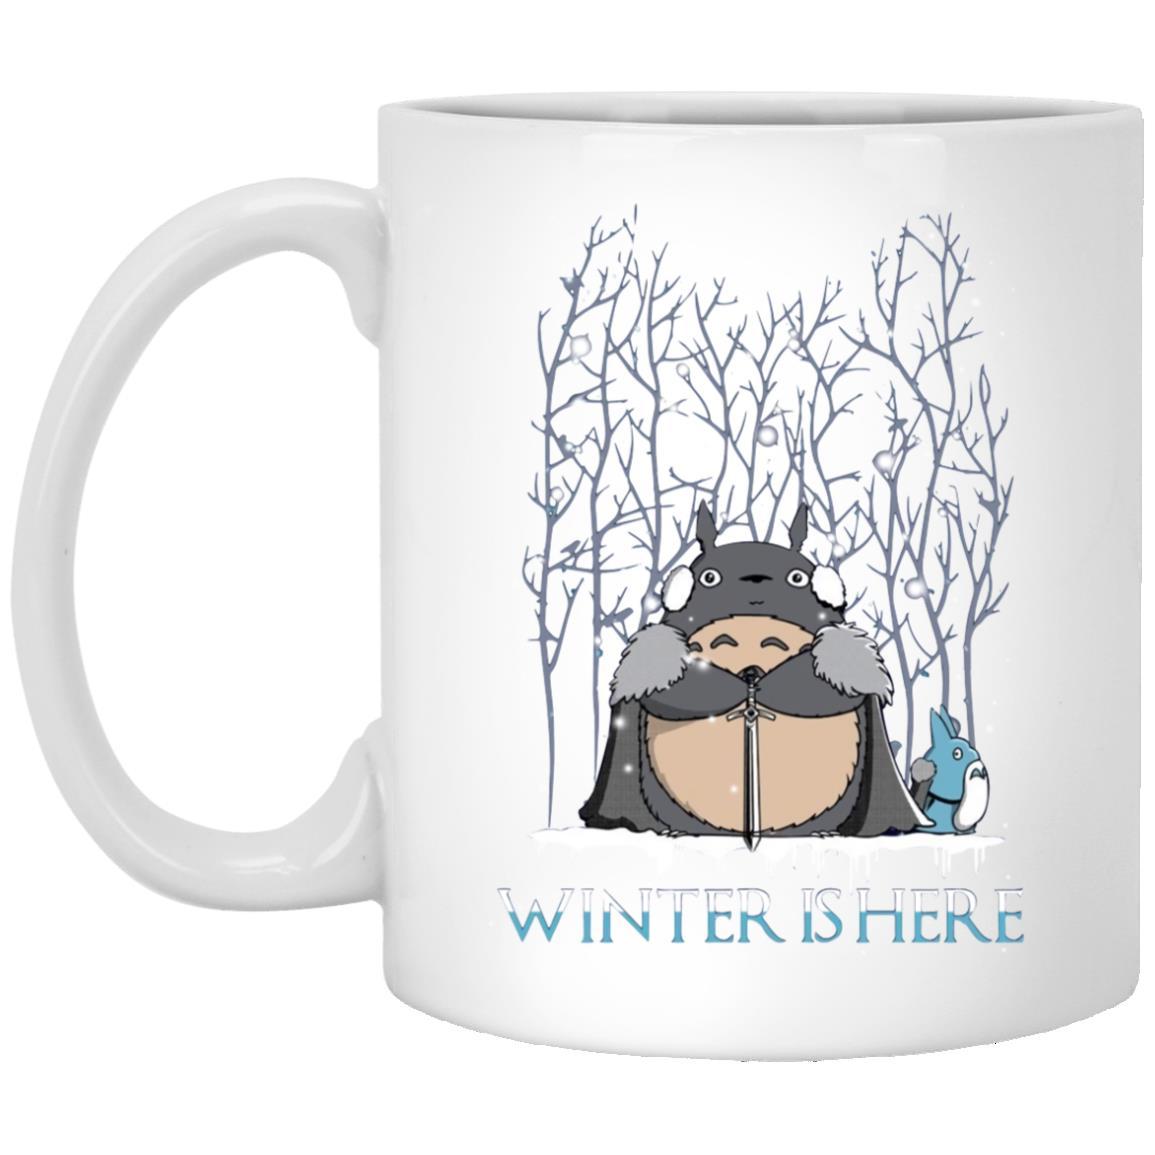 Totoro Game of Throne Winter is Here Mug